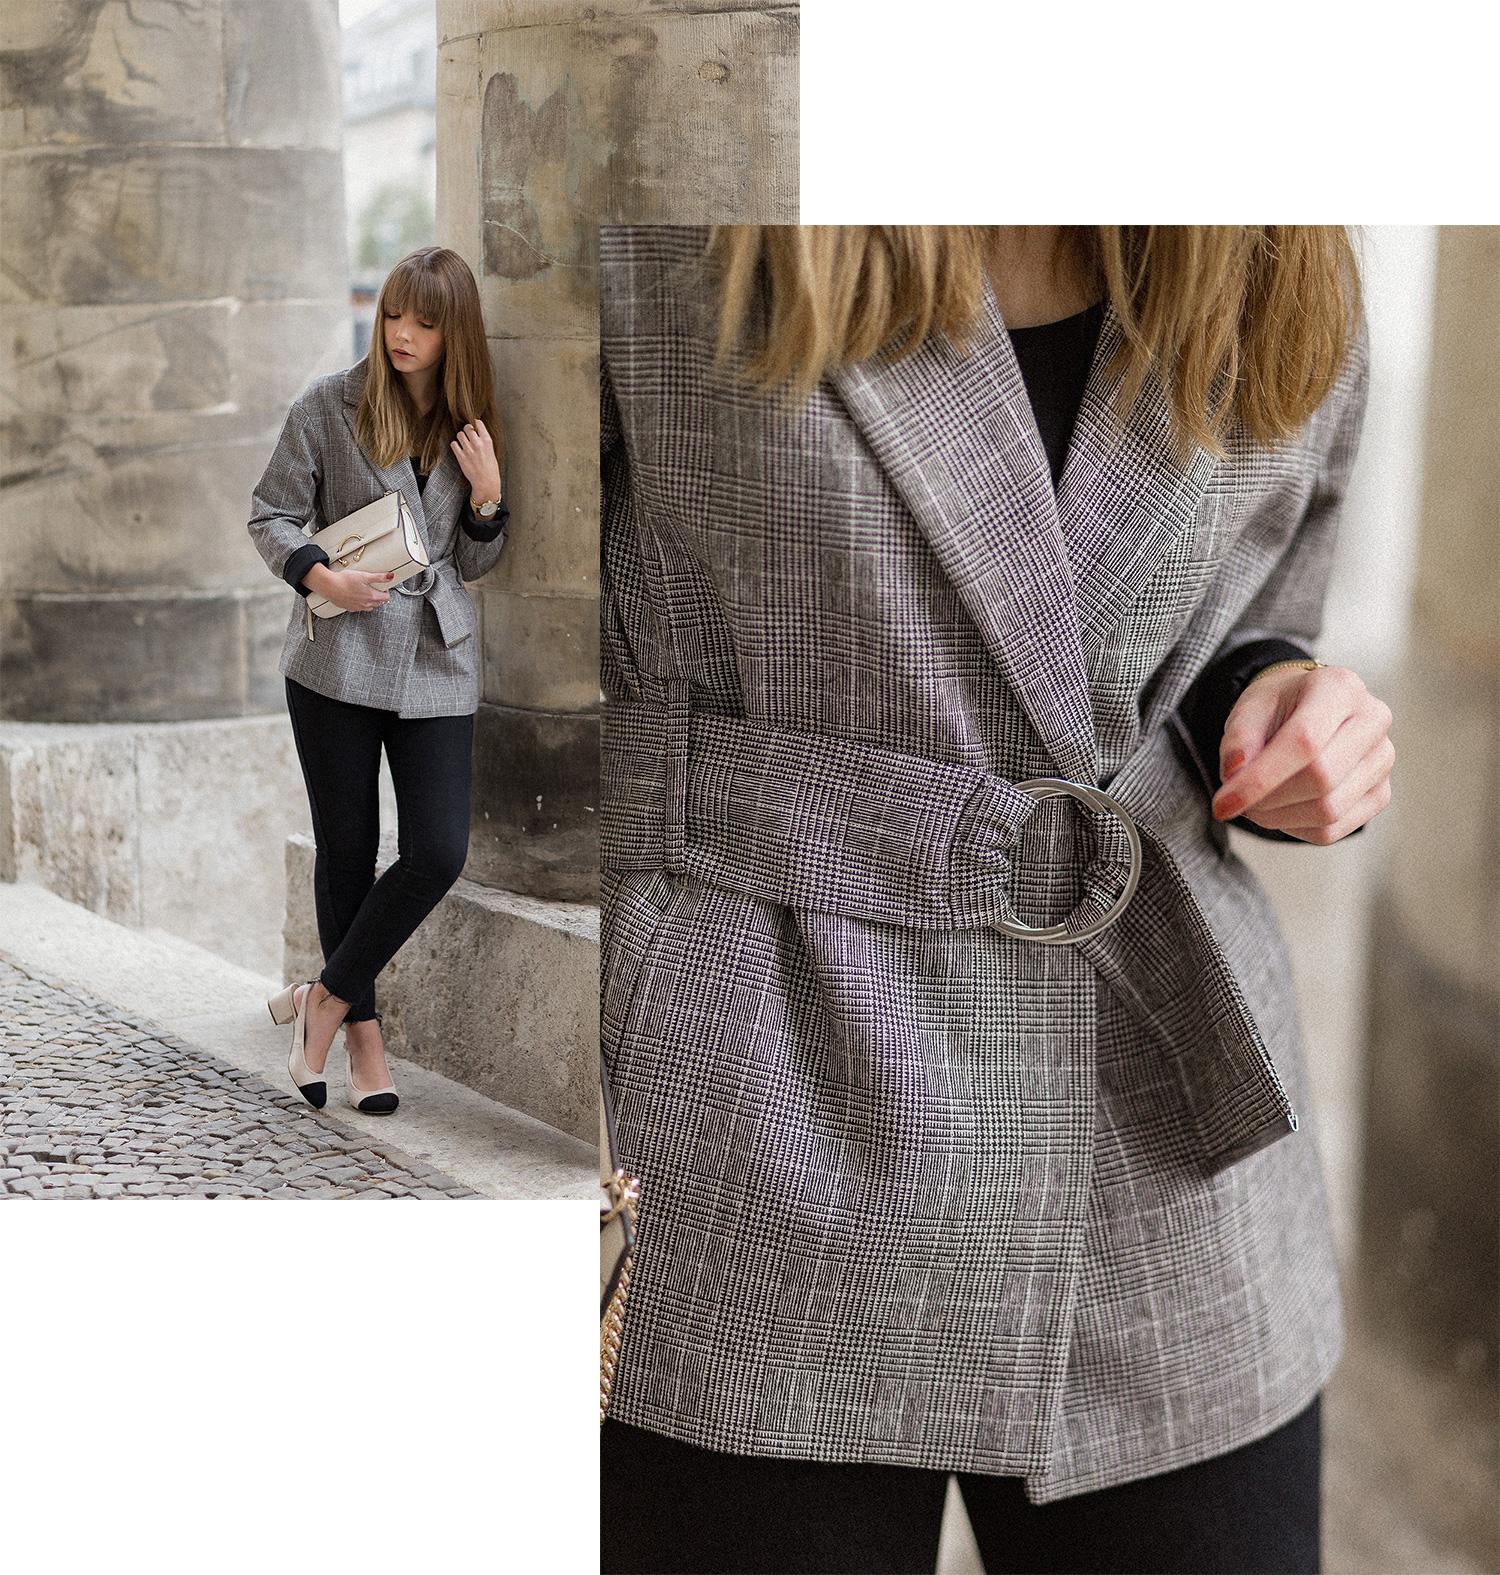 Glencheck Karo Muster, Herbst Trend 2017, karierter Blazer Outfit, bezauberndenana.de